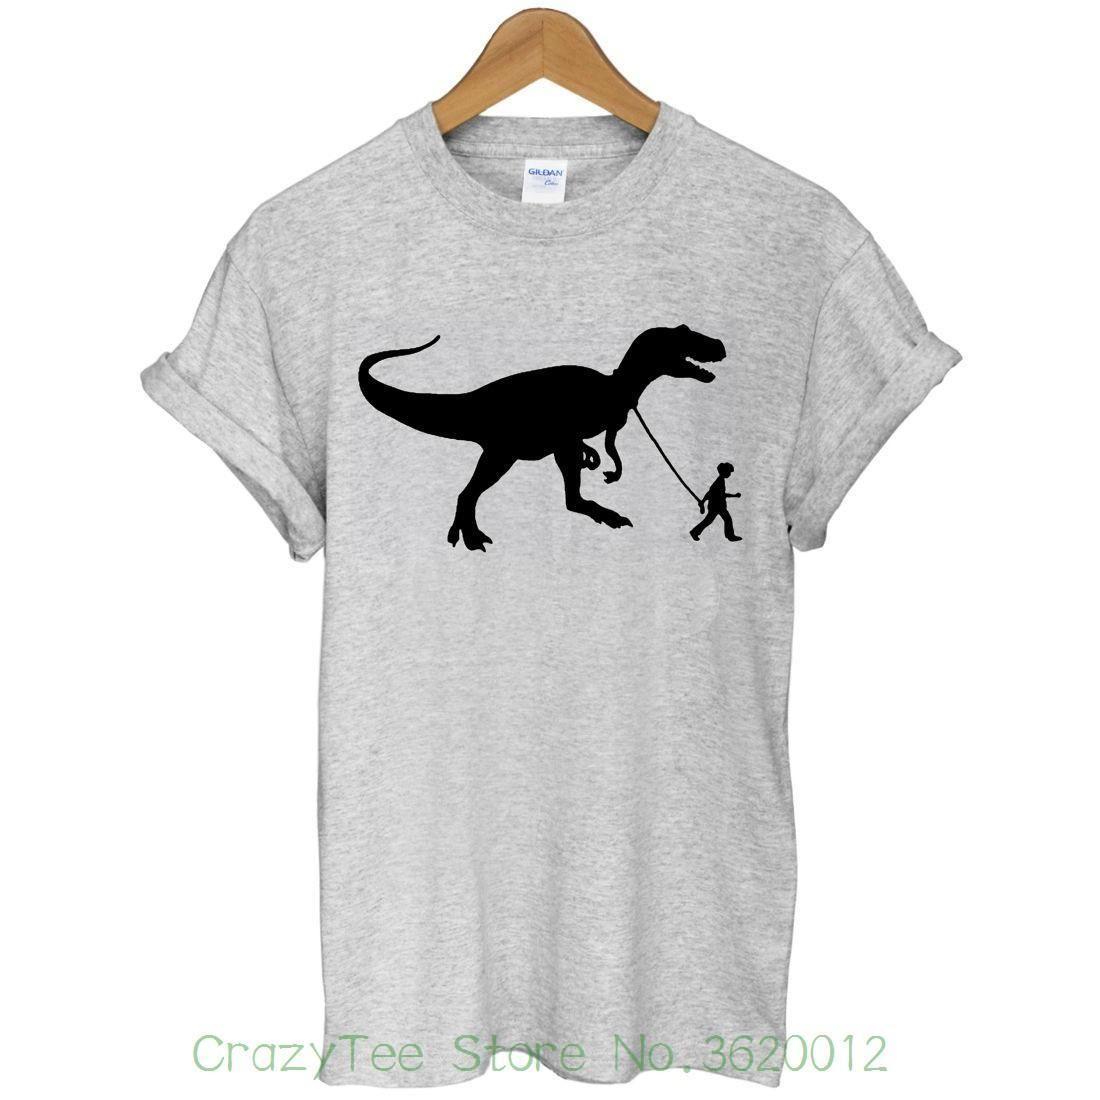 Women S Tee Best Friend 2 T Rex Dinosaur Park World Film Movie Funny Party  Gift Men T Shirt New Women Buy T Shirt Design Buy Tee From Lijian57 783986ff93